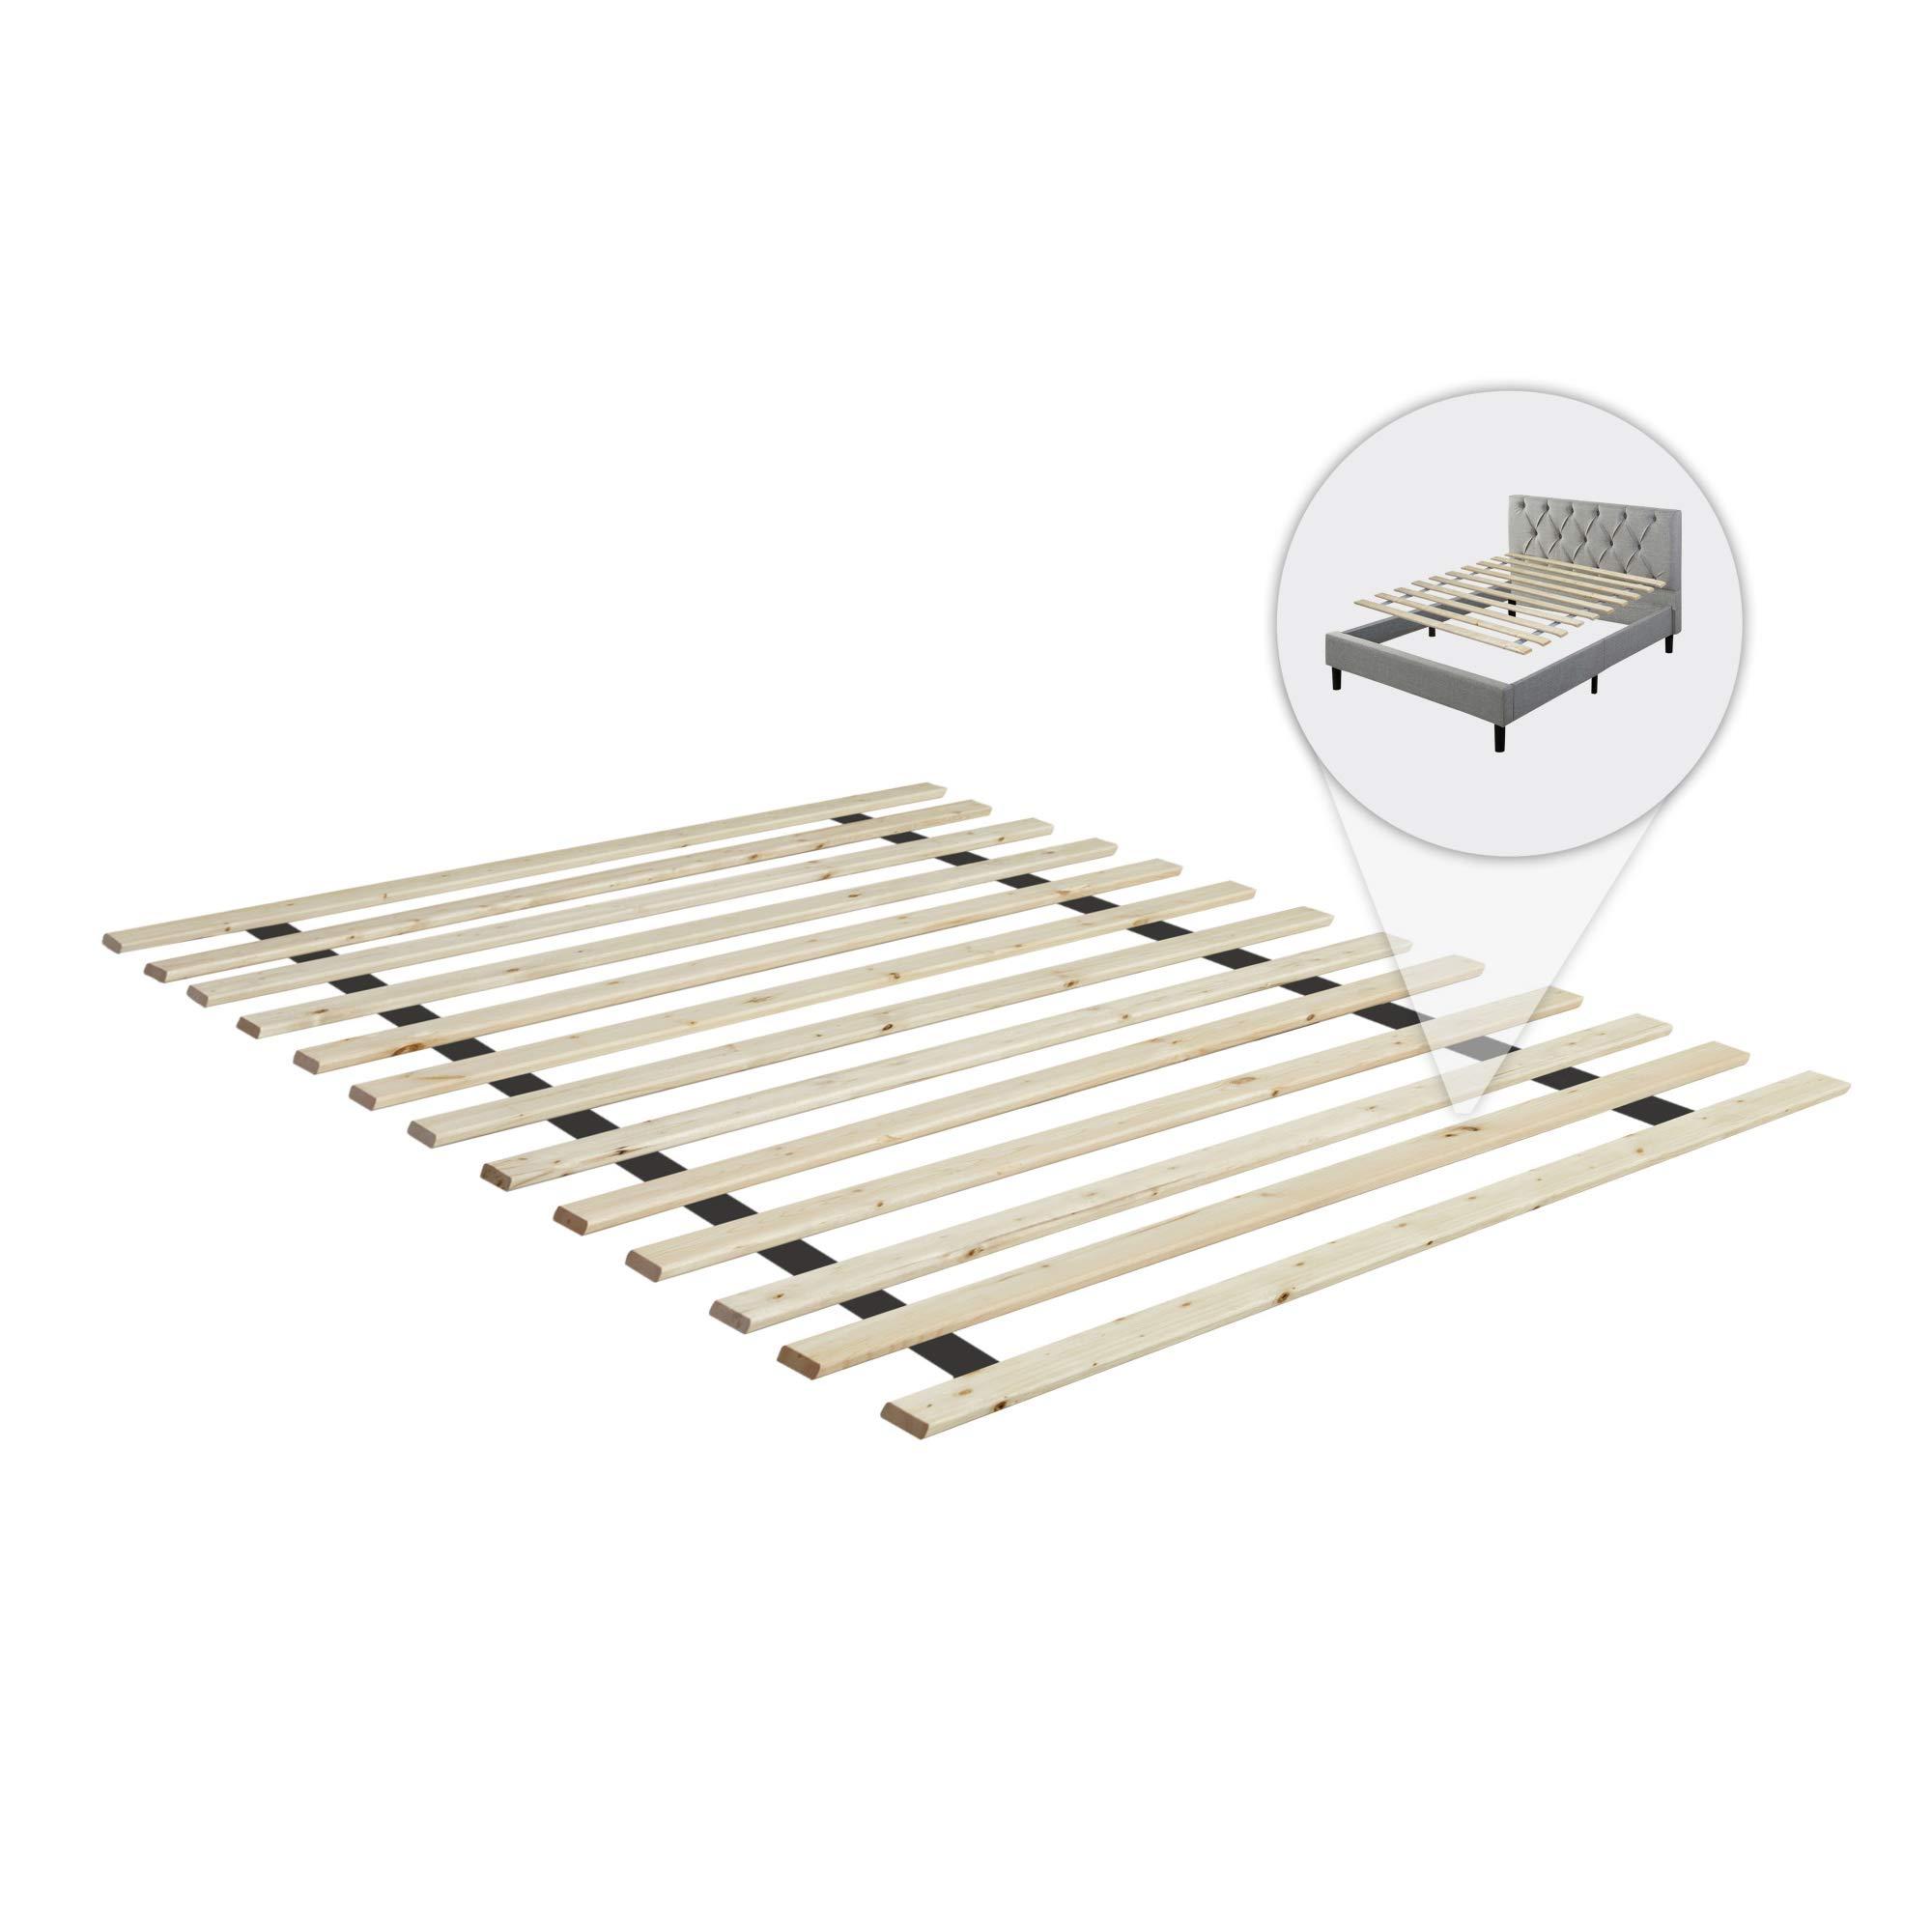 Continental Matress 1.5-Inch Standard Mattress Support Wooden Bunkie Board/Slats, Twin, Beige